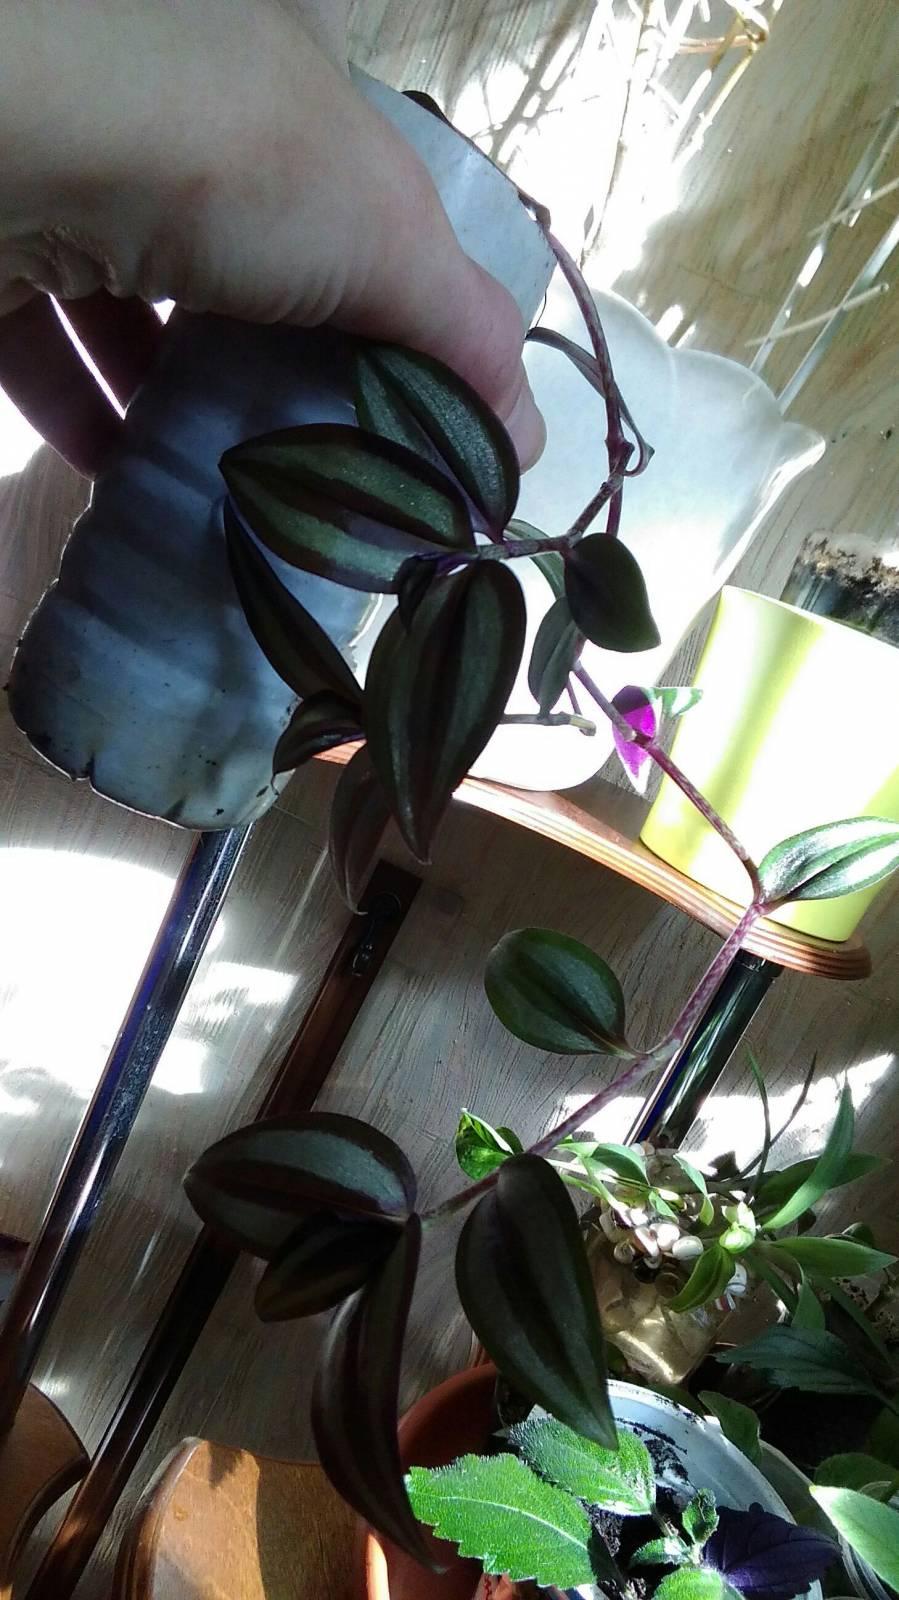 Меняю Комнатные цветы; Садовое: луковицы; семена Москва +МО 254408566